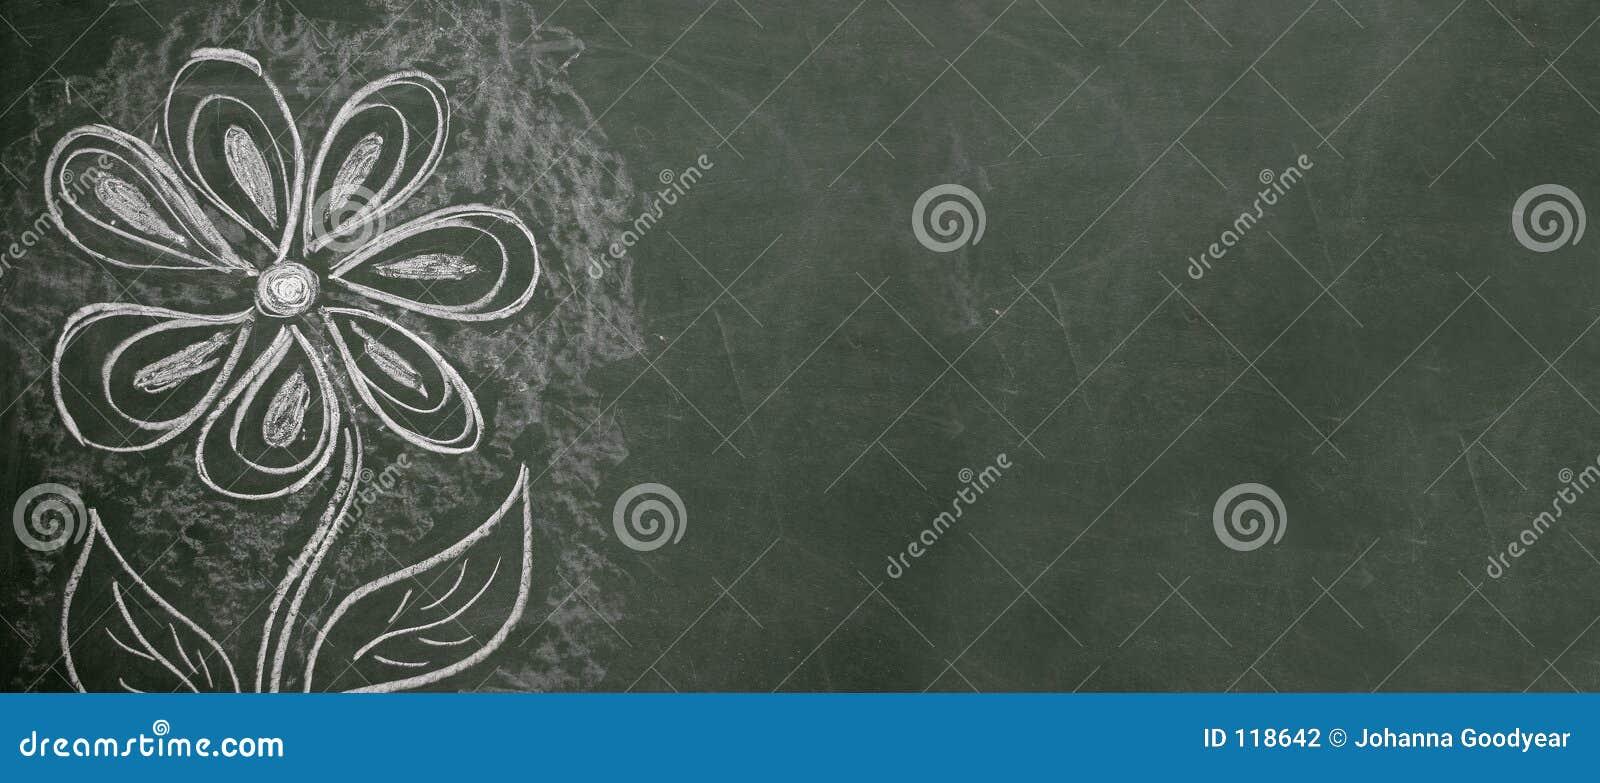 chalkboard drawing stock photo  image of elementary